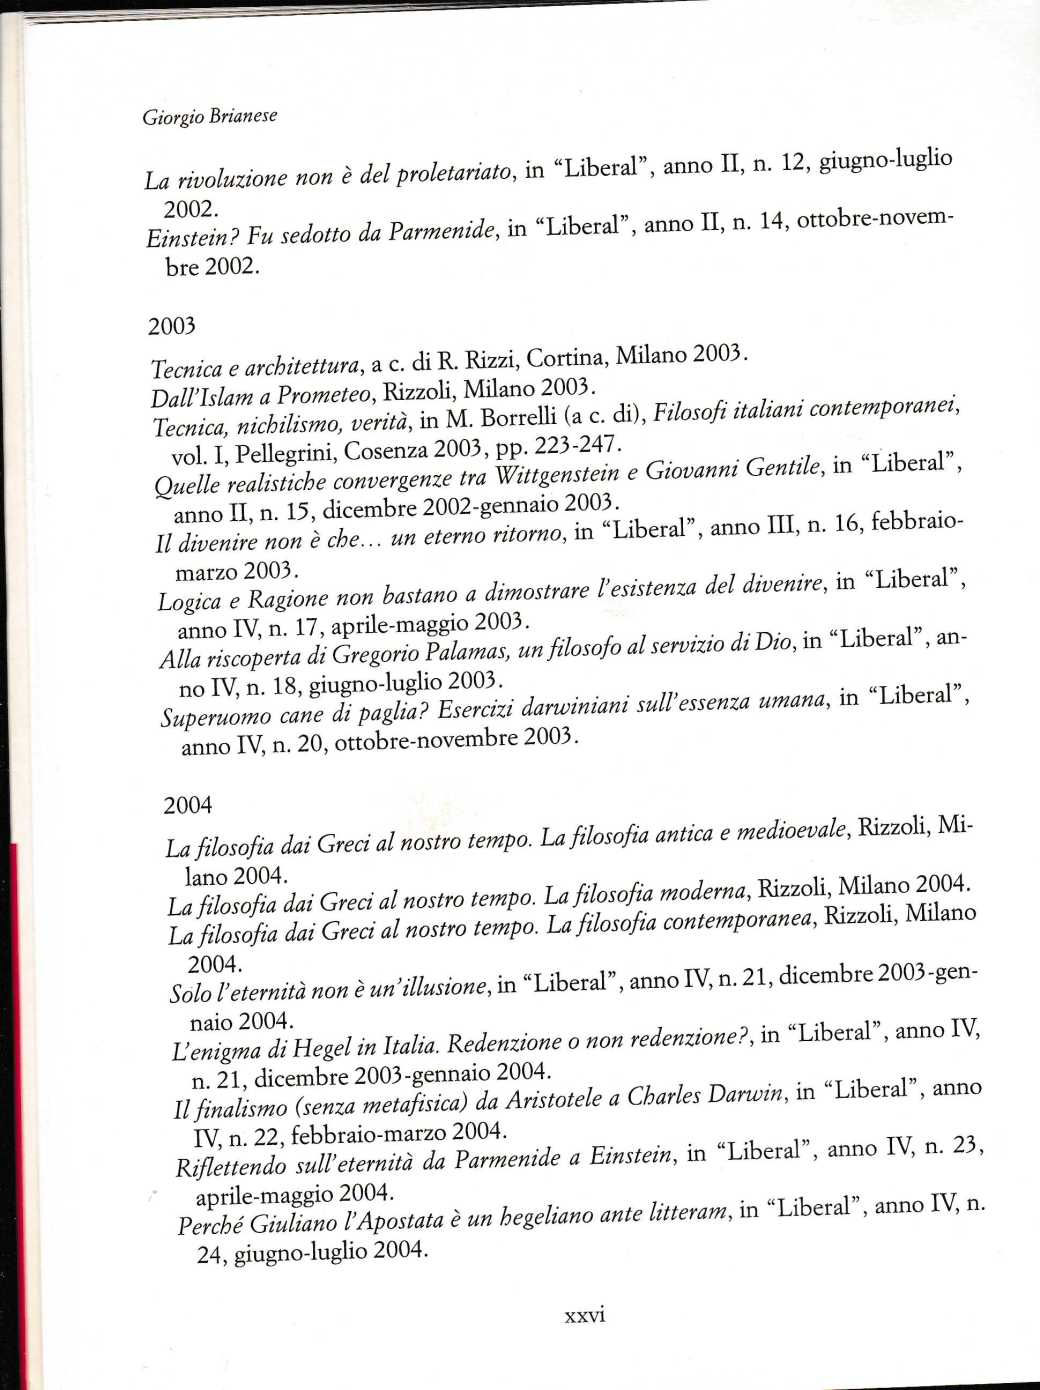 biblio brianese 1948-20051964